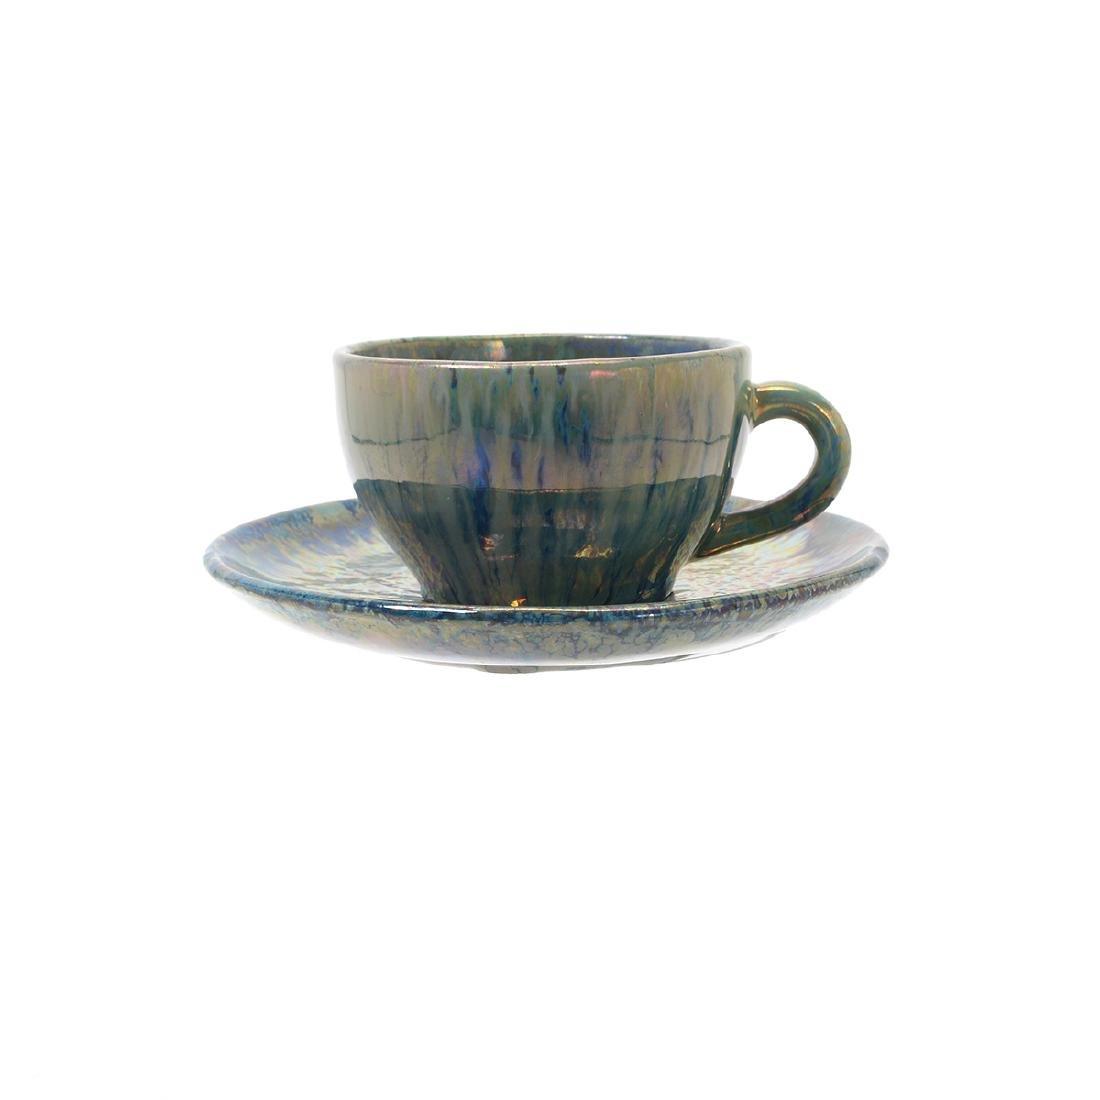 Alphonse Cytere Iridescent Art Pottery Tea Service - 4